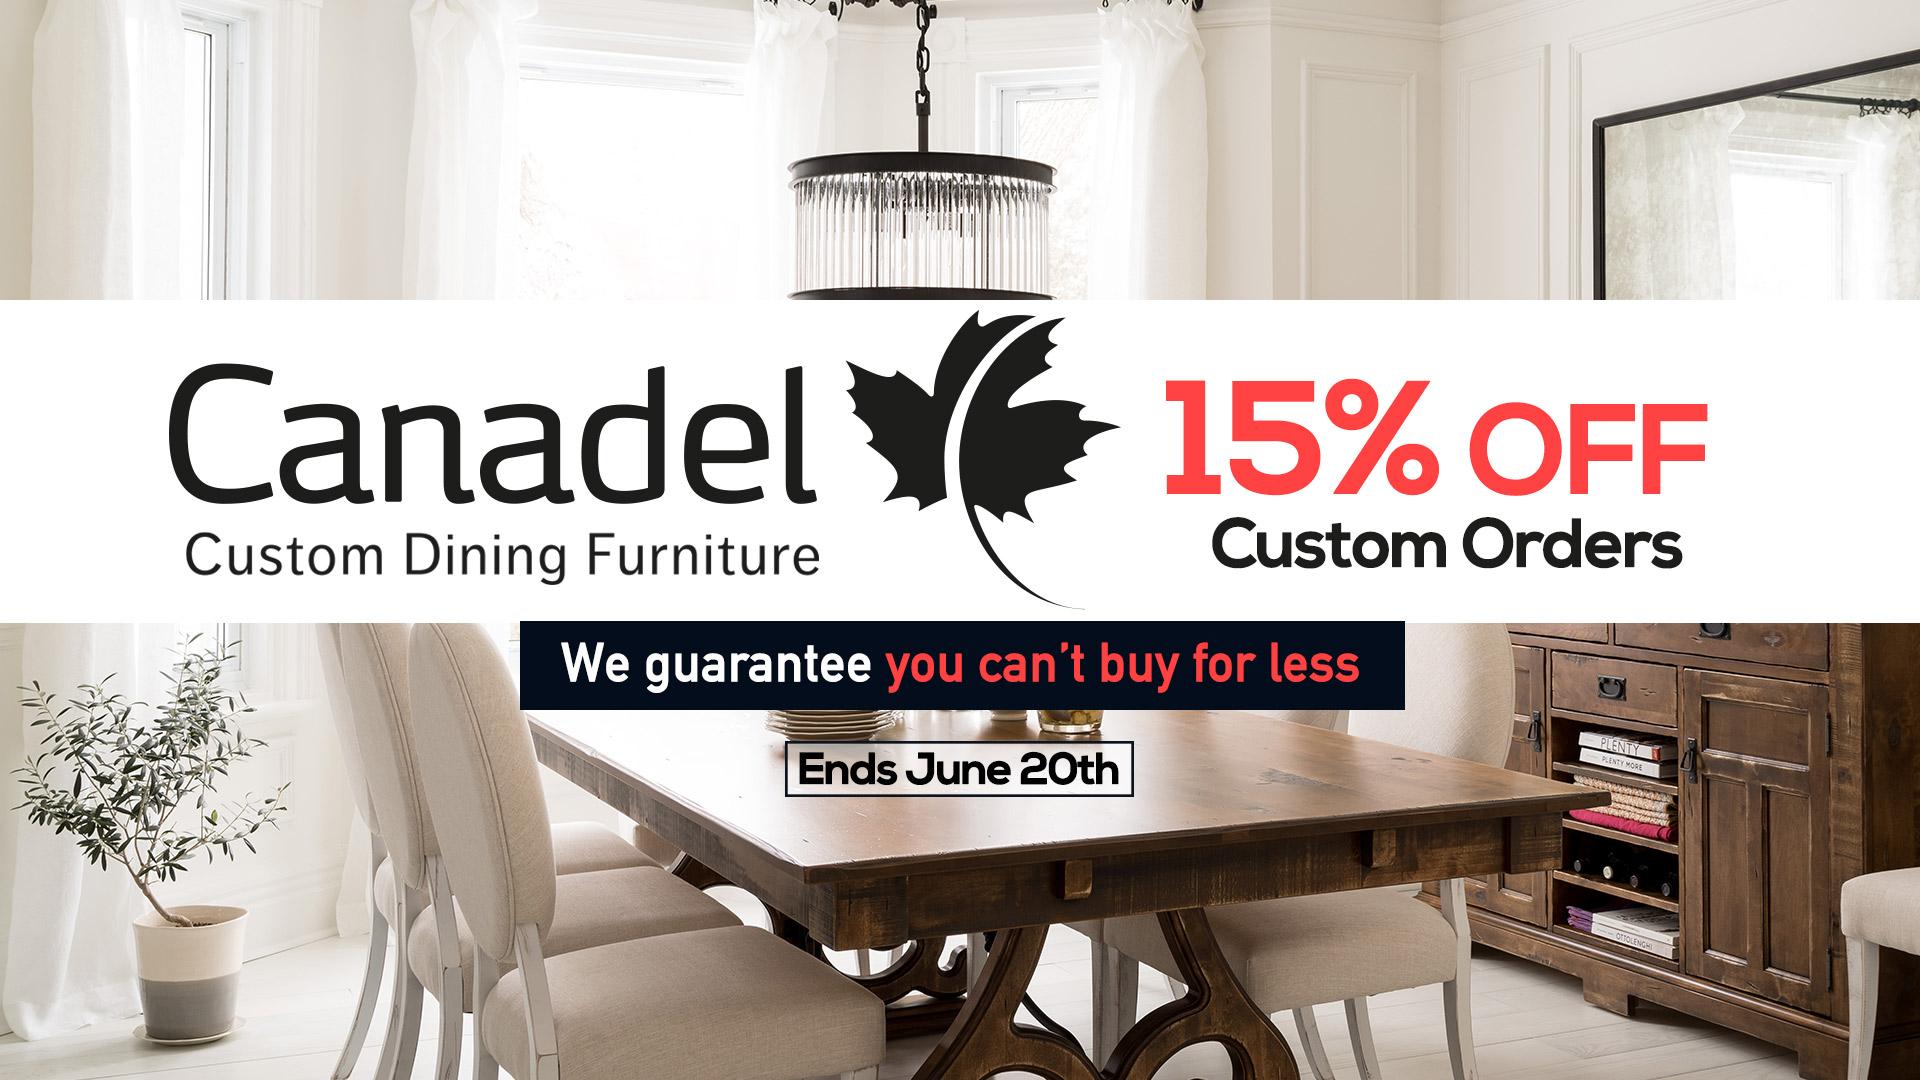 Canadel Dining Furniture Sale Coulters June 2019 Slider Home